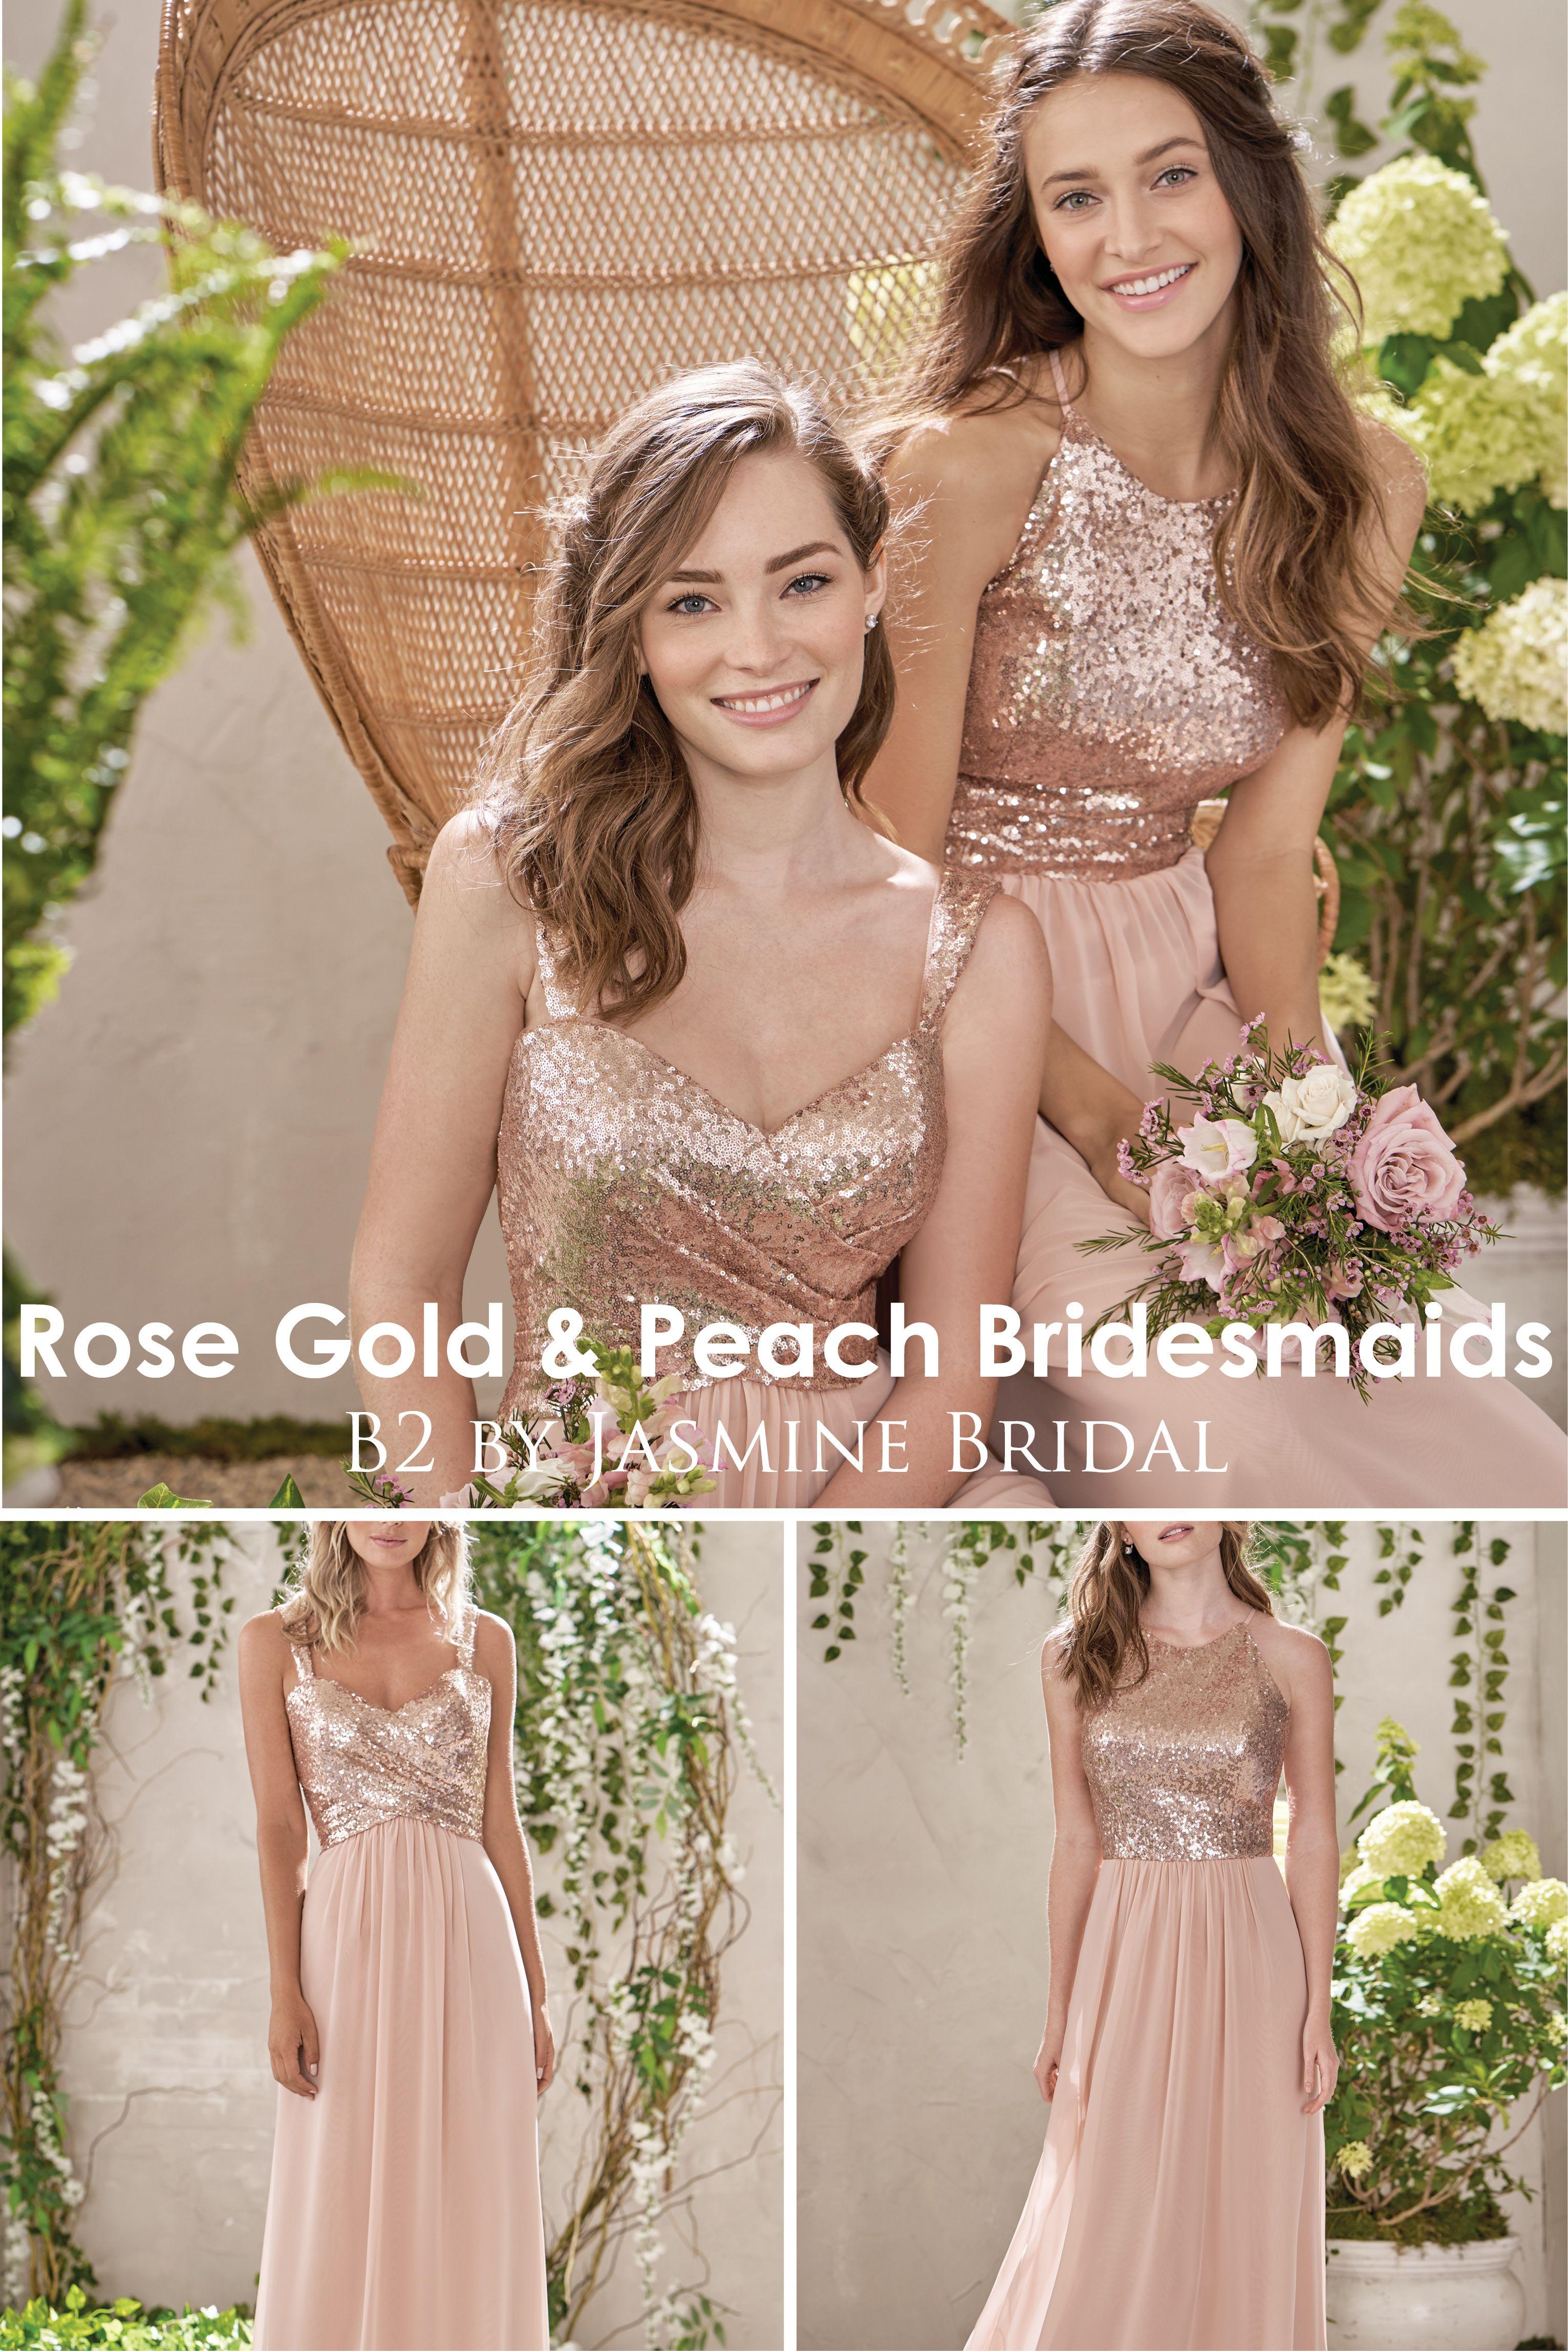 Jasmine Bridal B2 Rose Gold Peach Bridesmaids Designer Bridesmaid Dresses Rose Peach Bridesmaid Rose Gold Bridesmaid Dress Peach Lace Dress Bridesmaid